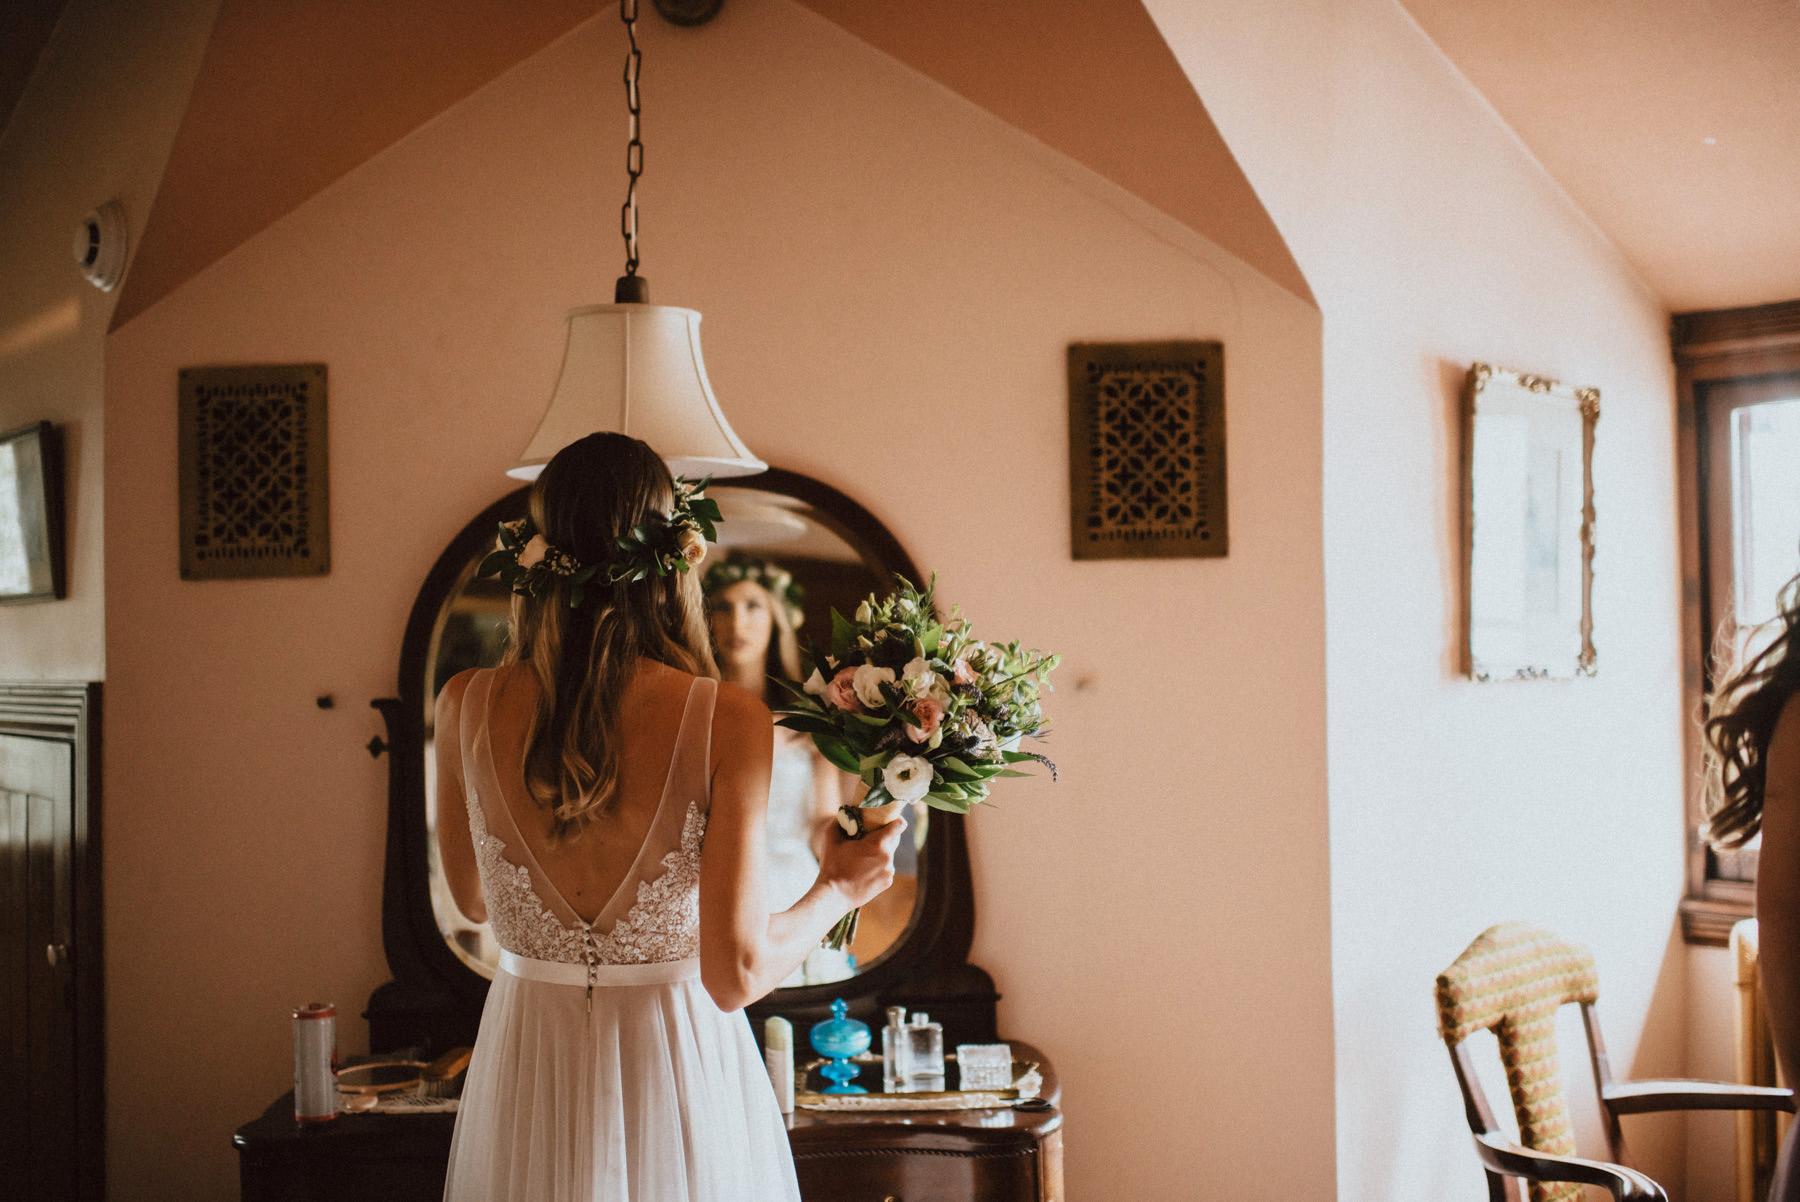 086-knowlton-mansion-wedding-8.jpg